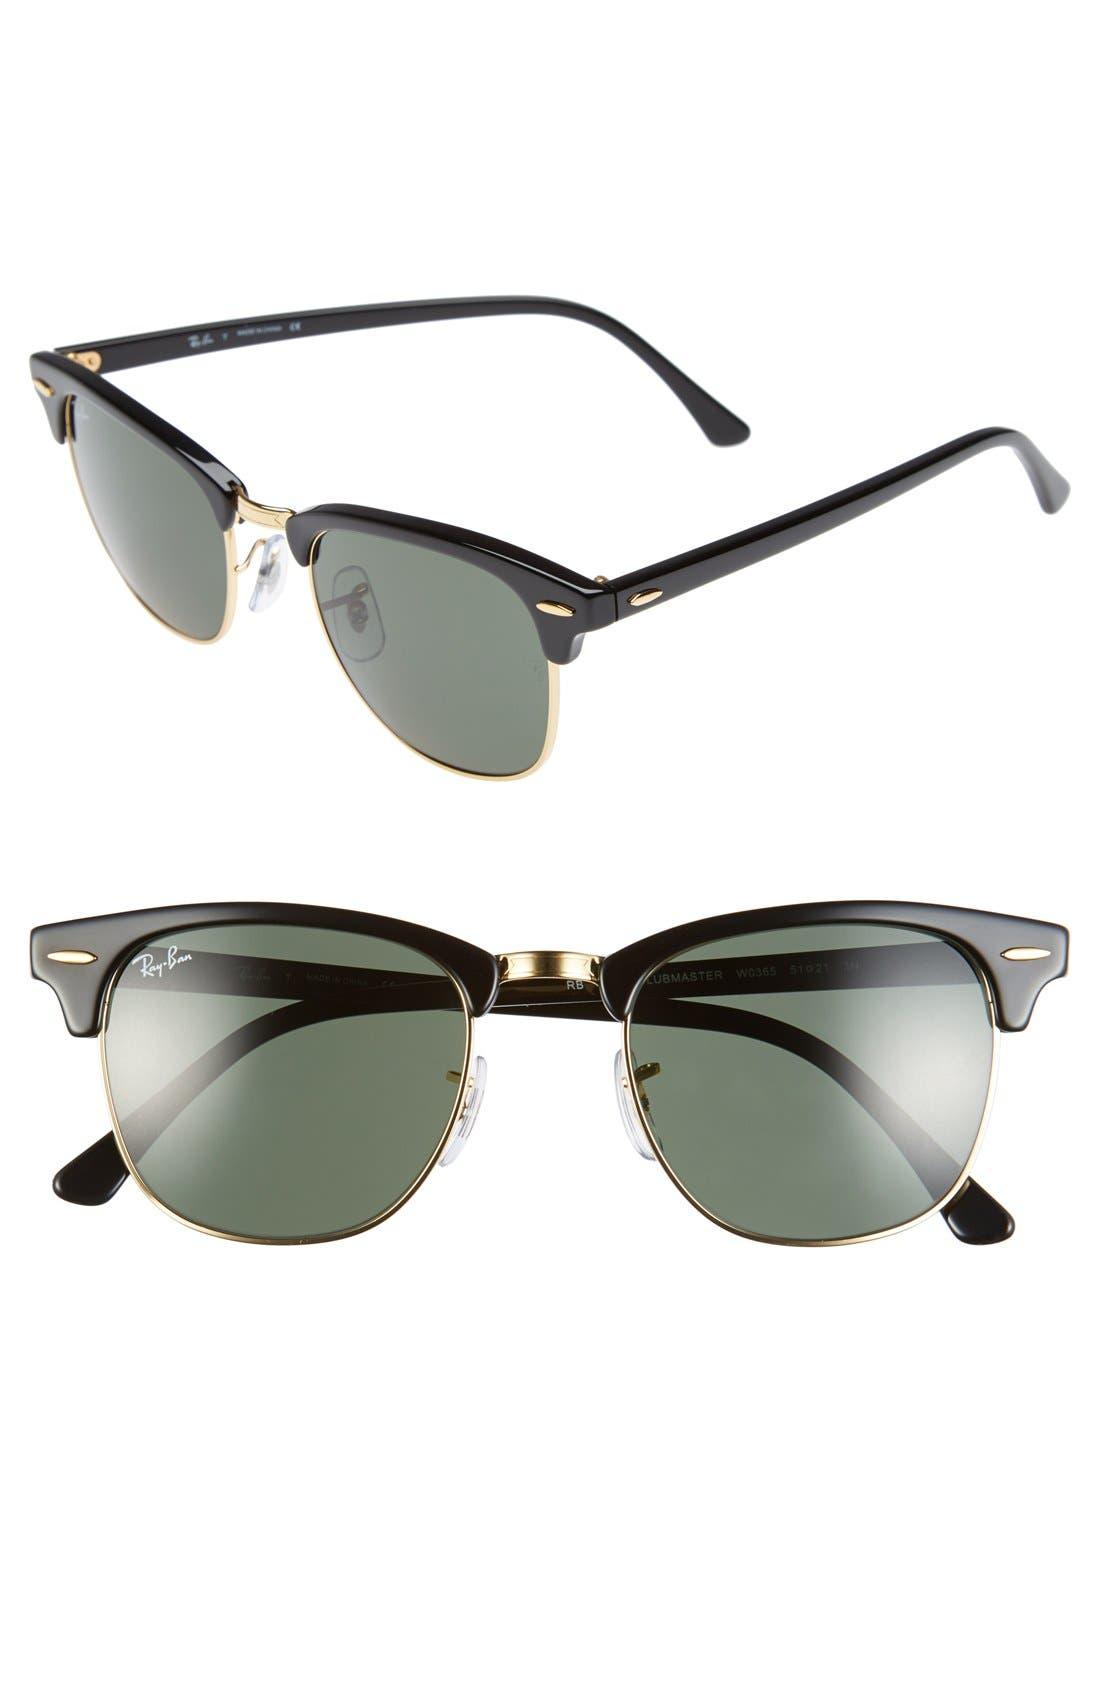 Ray-Ban Standard Clubmaster 51Mm Sunglasses - Black